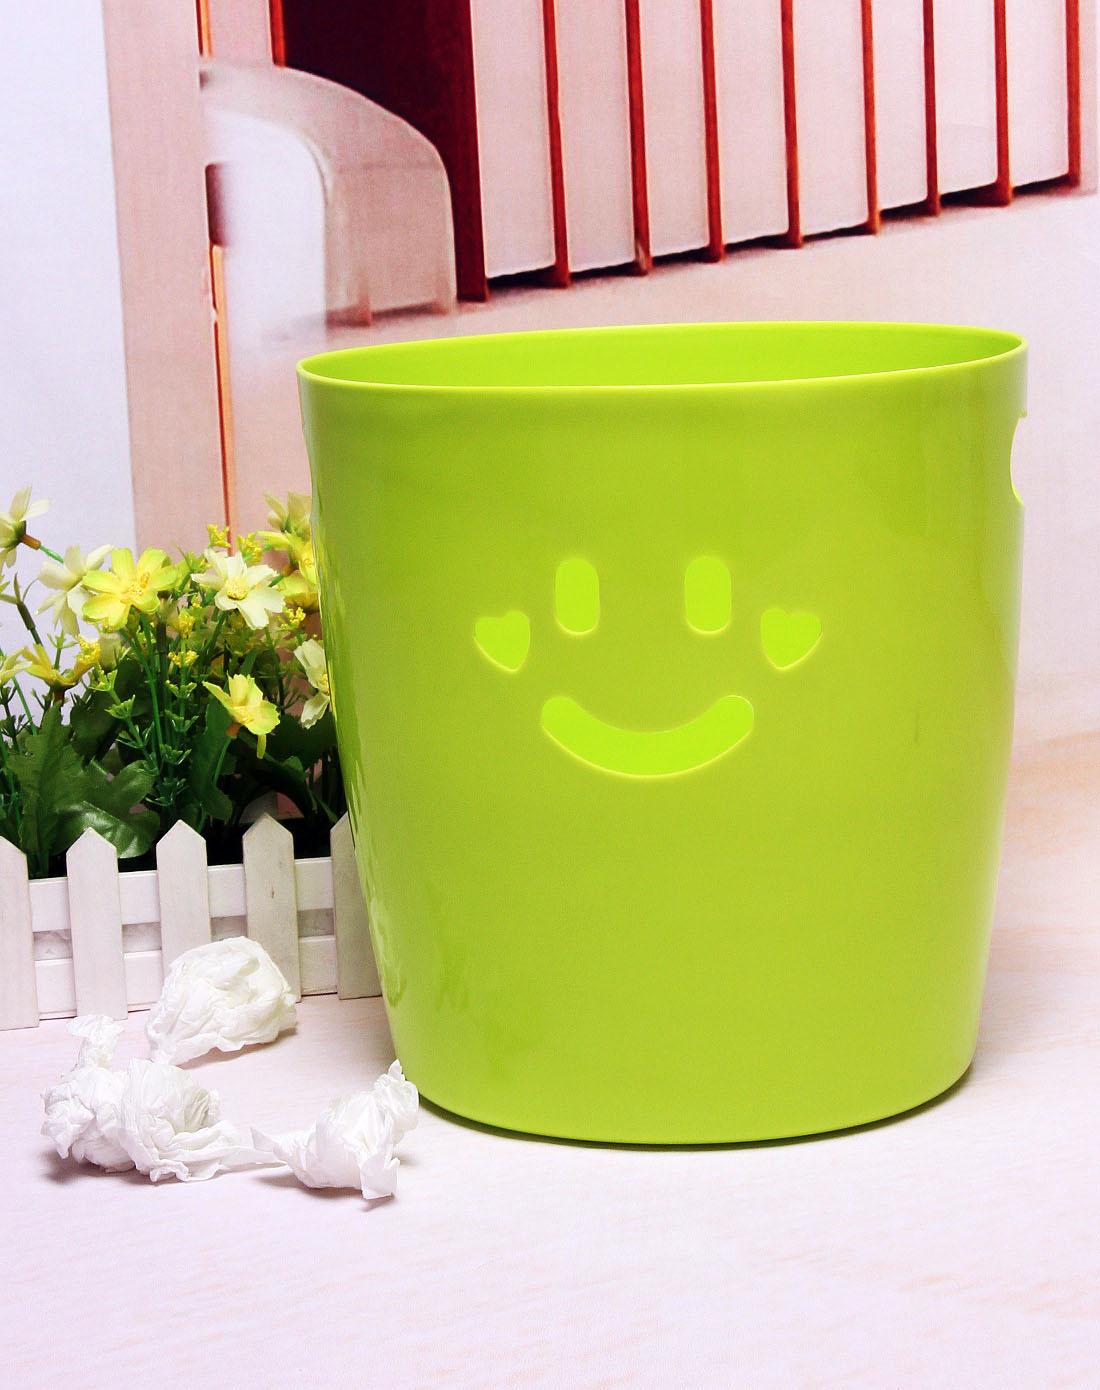 h&3家居用品专场可爱绿色笑脸收纳桶6920130503080